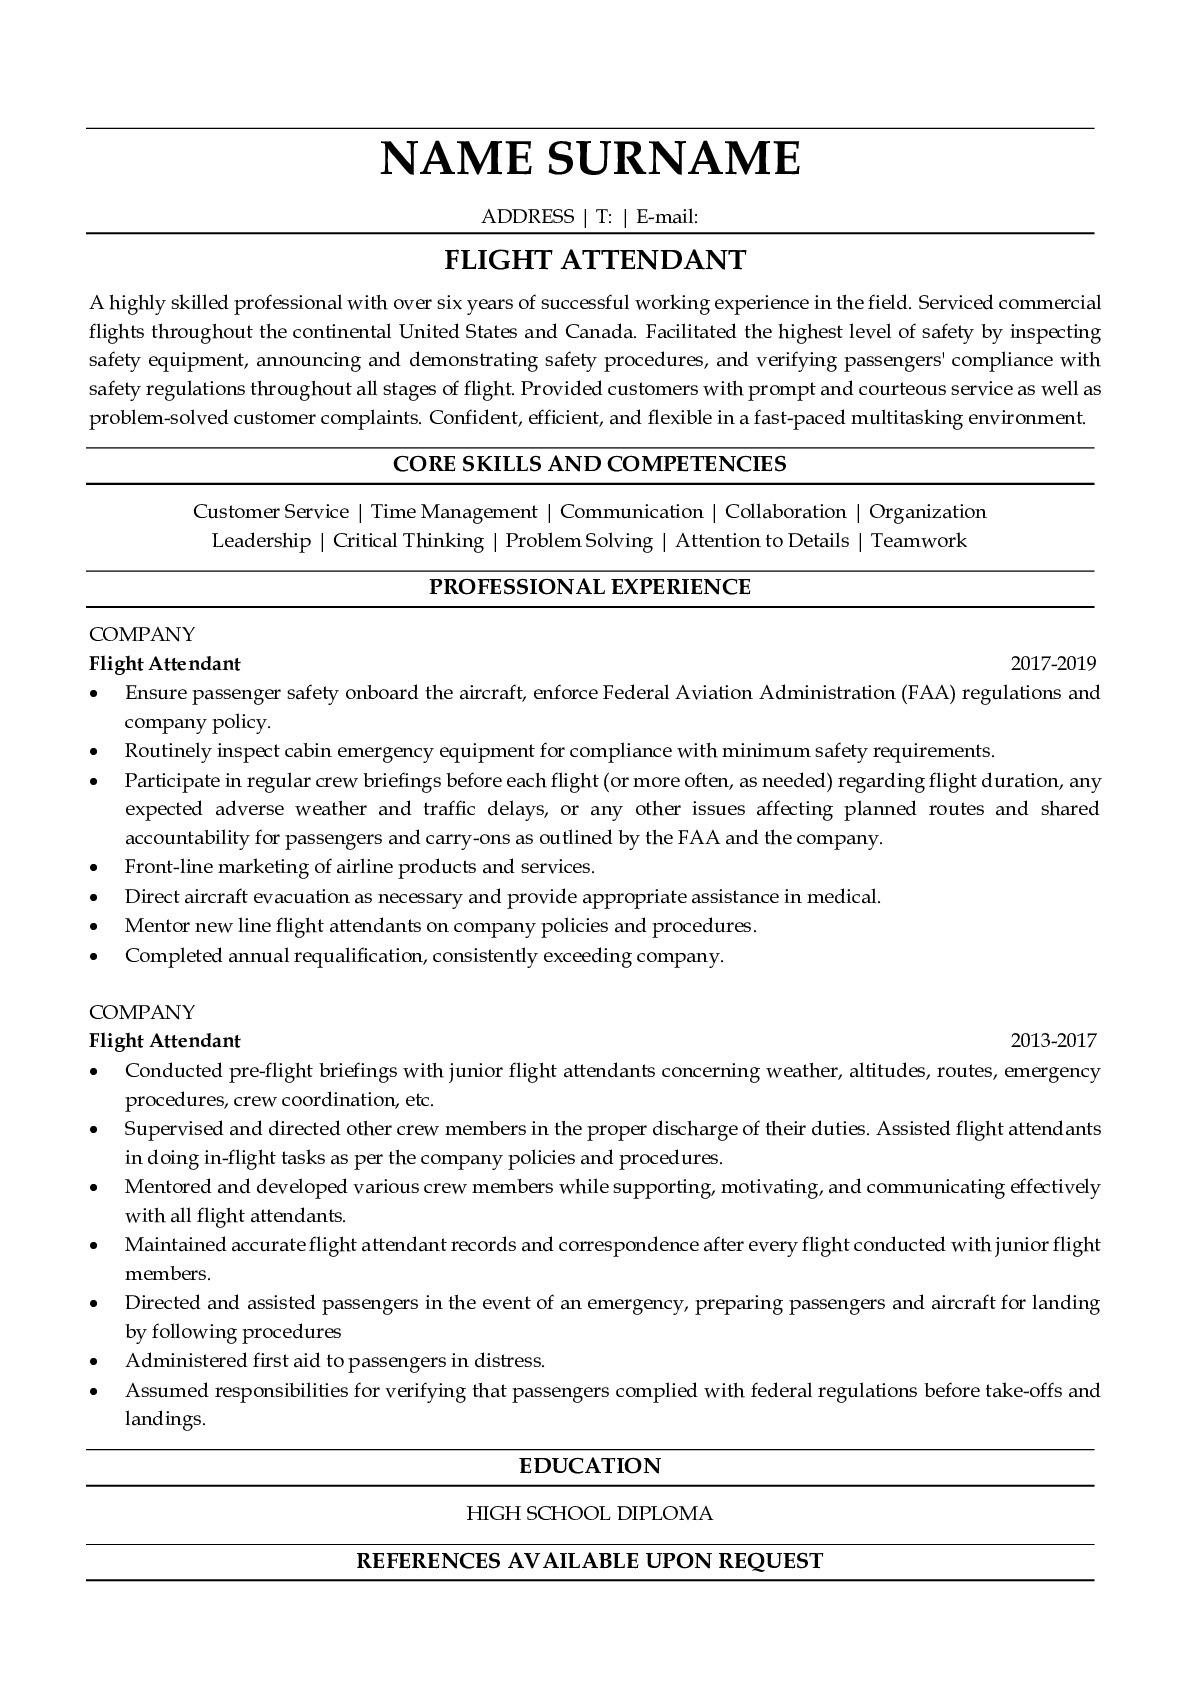 Resume Example for Flight Attendant